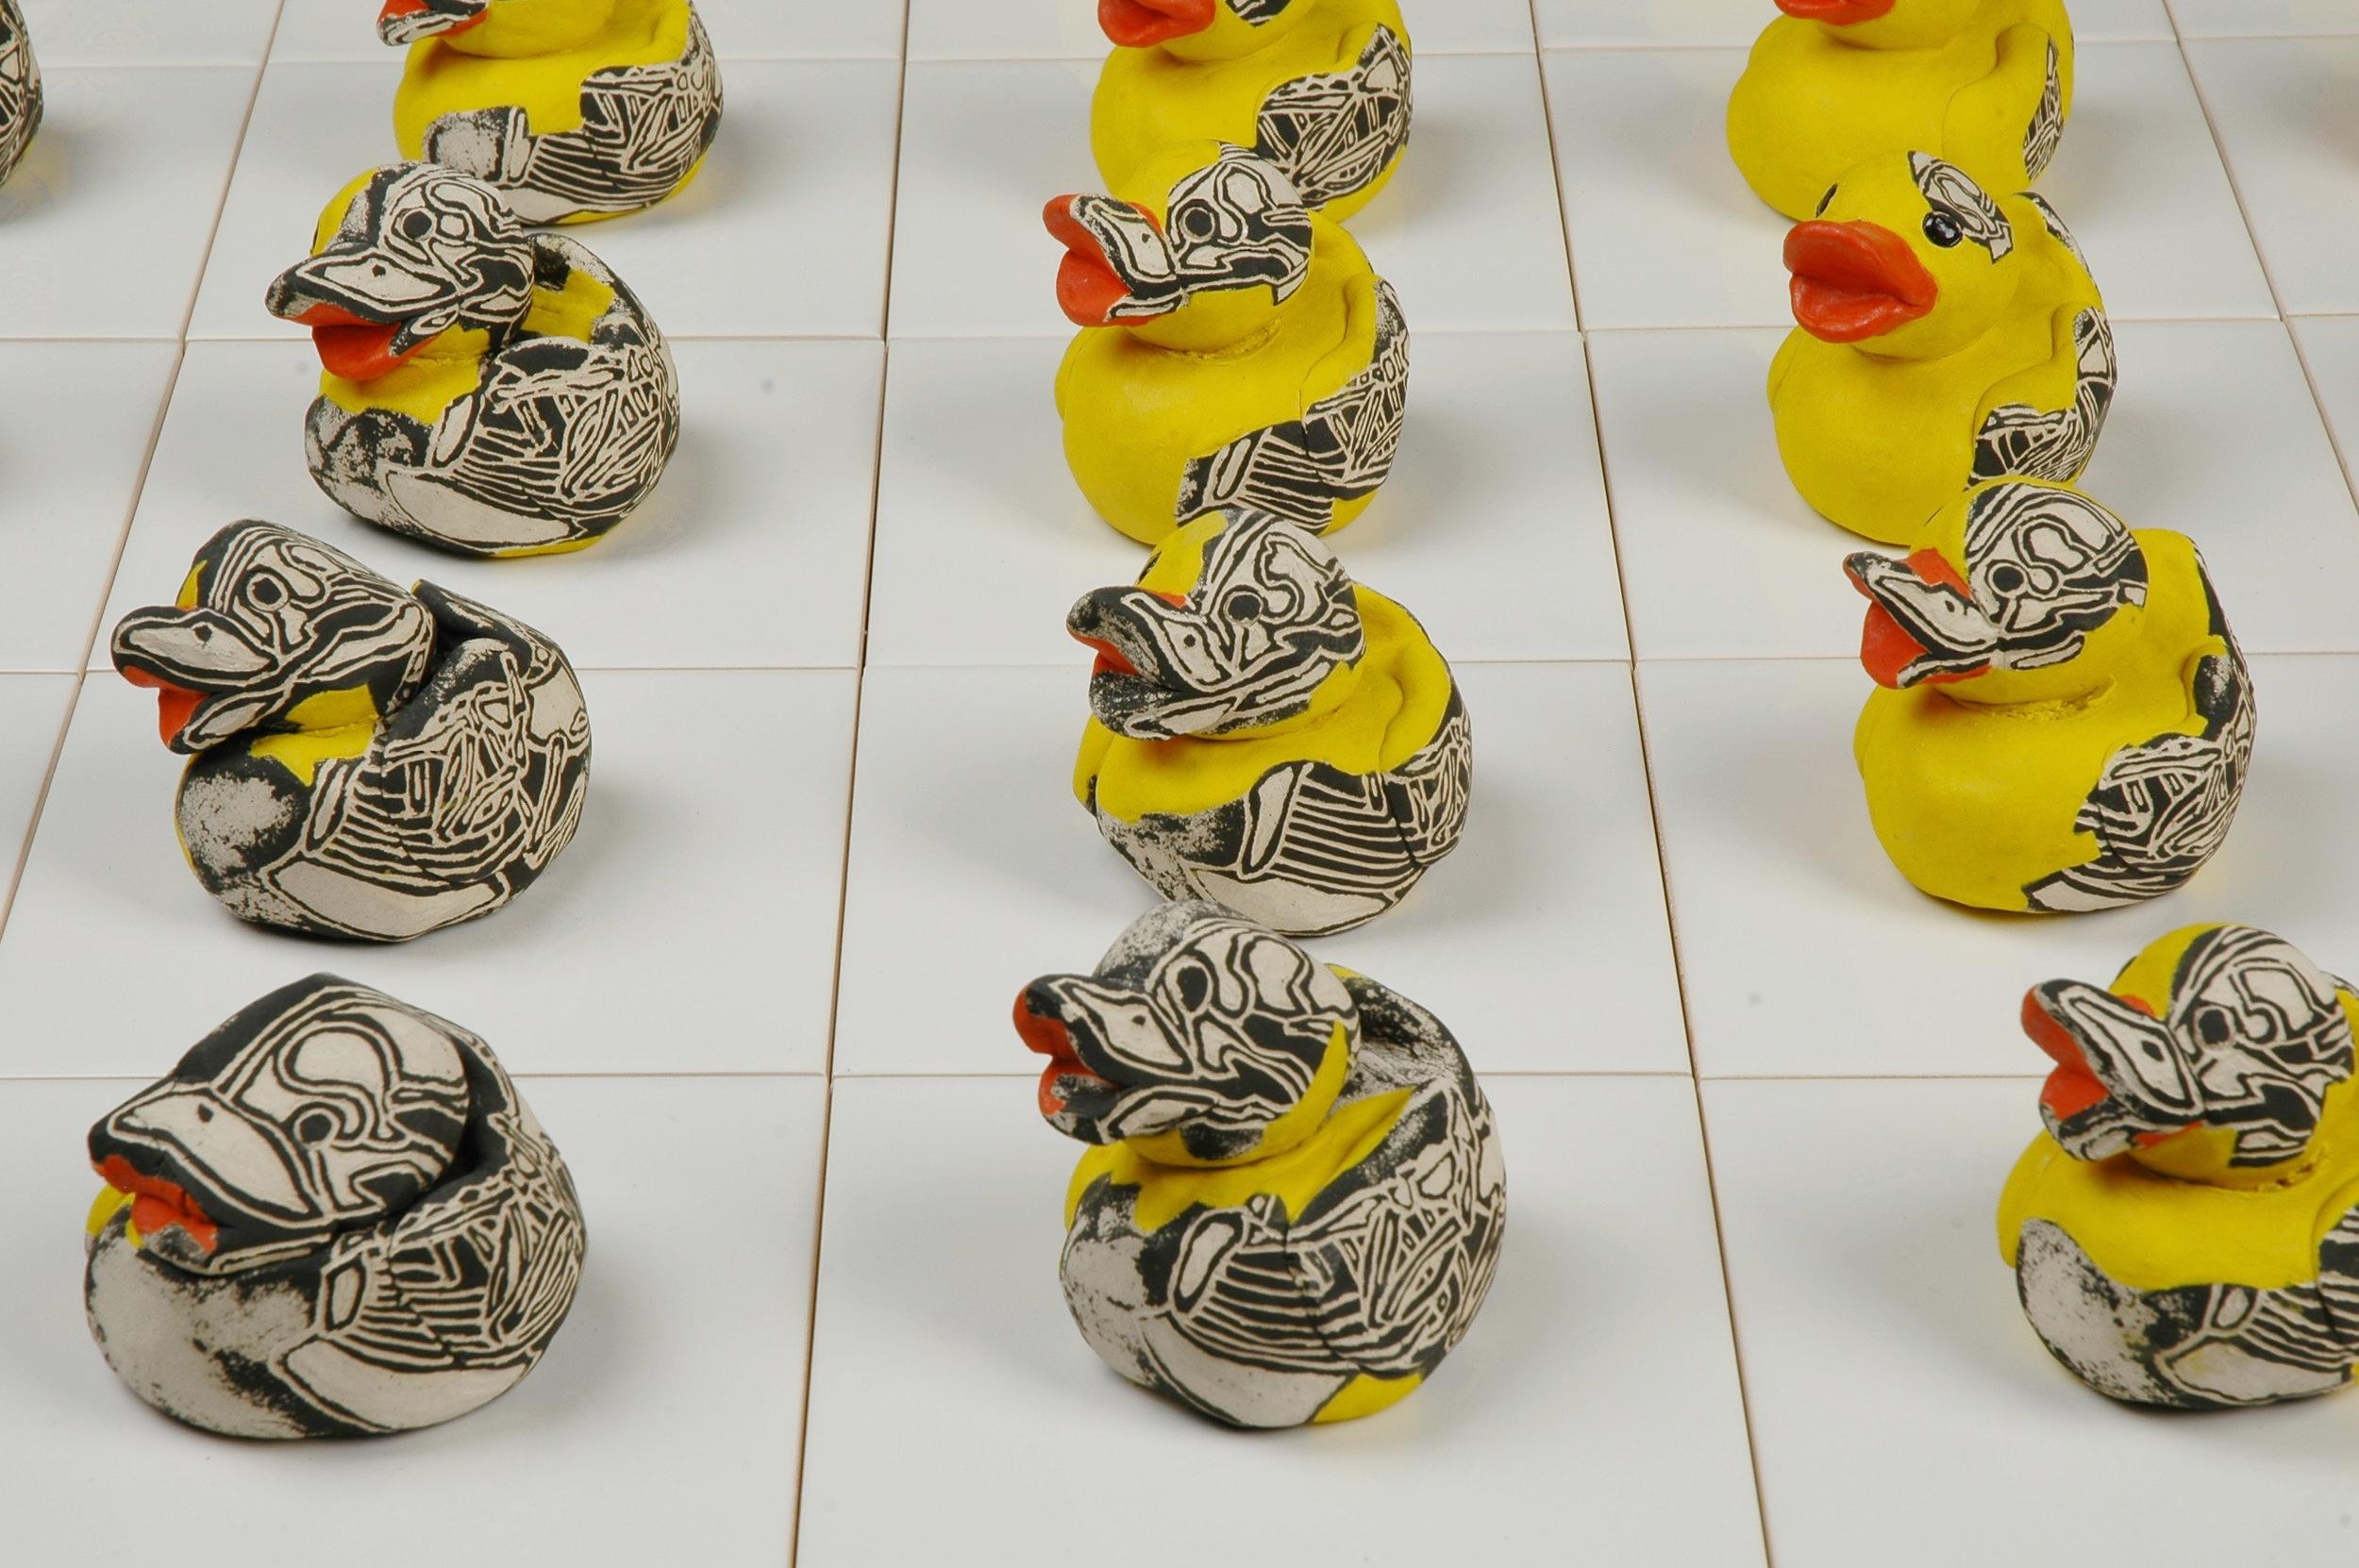 Deconstruction of My Rubber Ducky.det.2.JPG